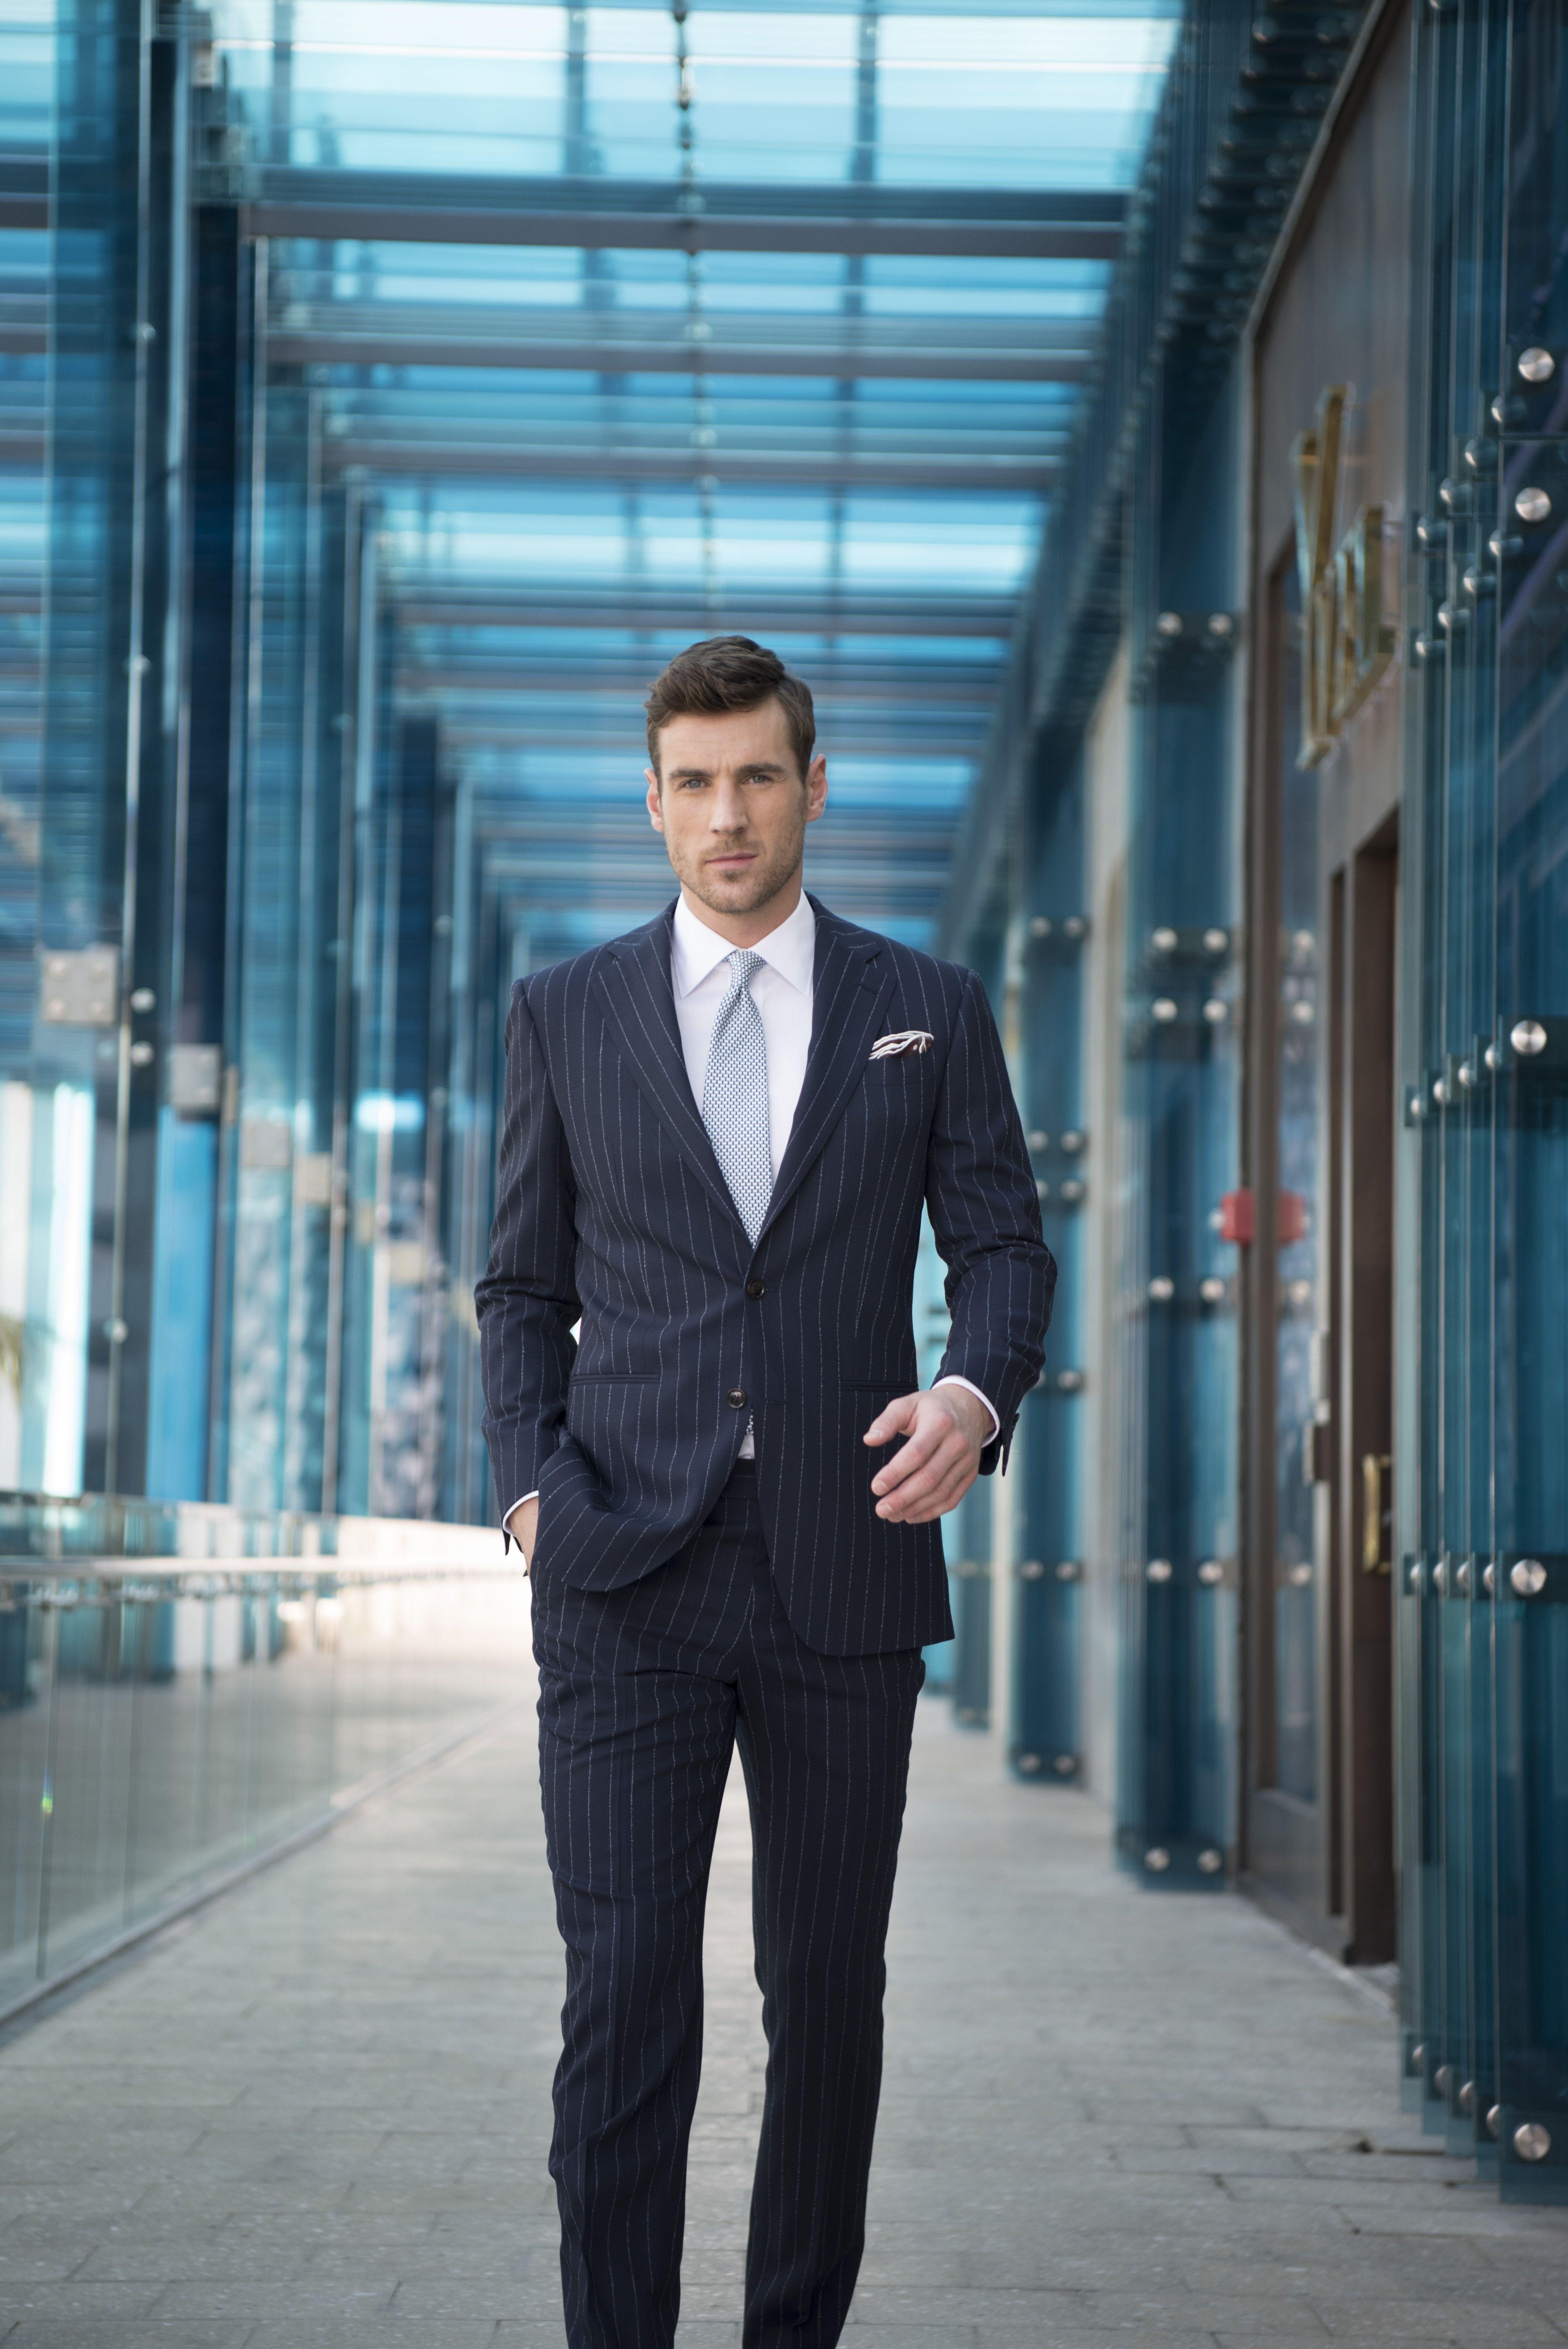 60244c04efa LORO PIANA NAVY CHALKSTRIPE SUIT Custom Tailored Suits